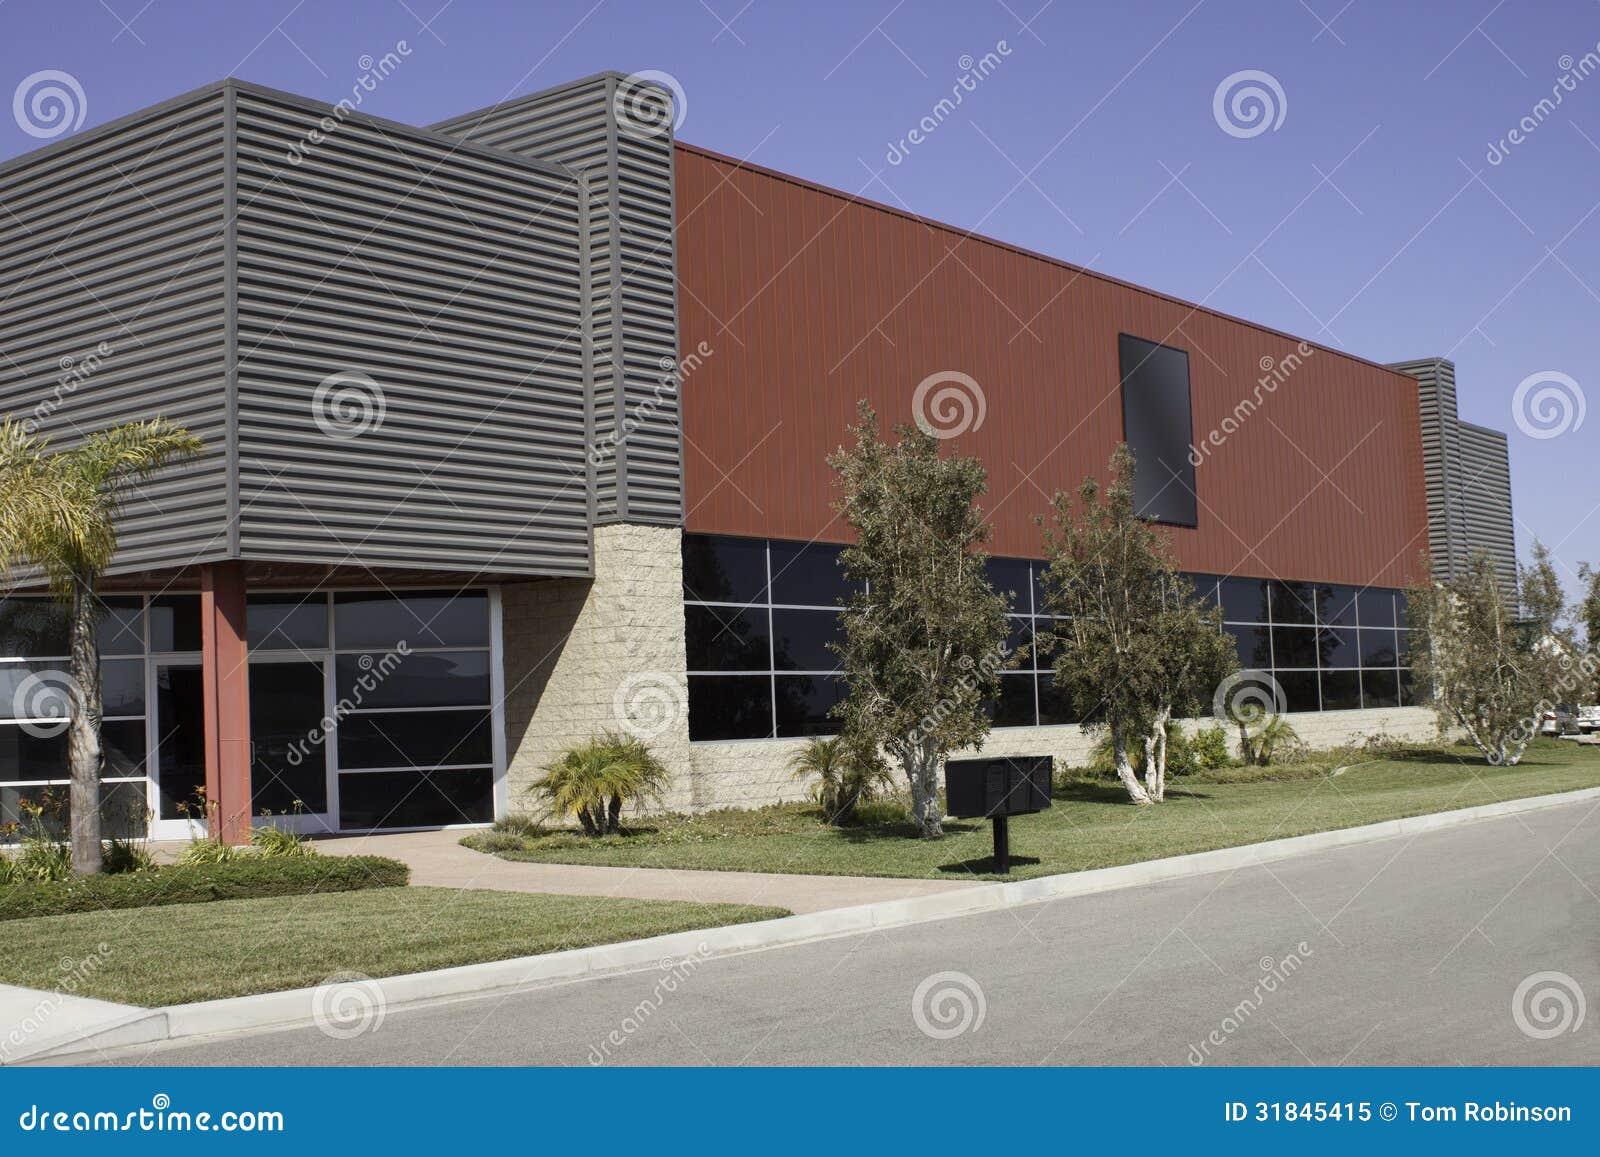 Two story commercial building plans joy studio design for Metal building office plans